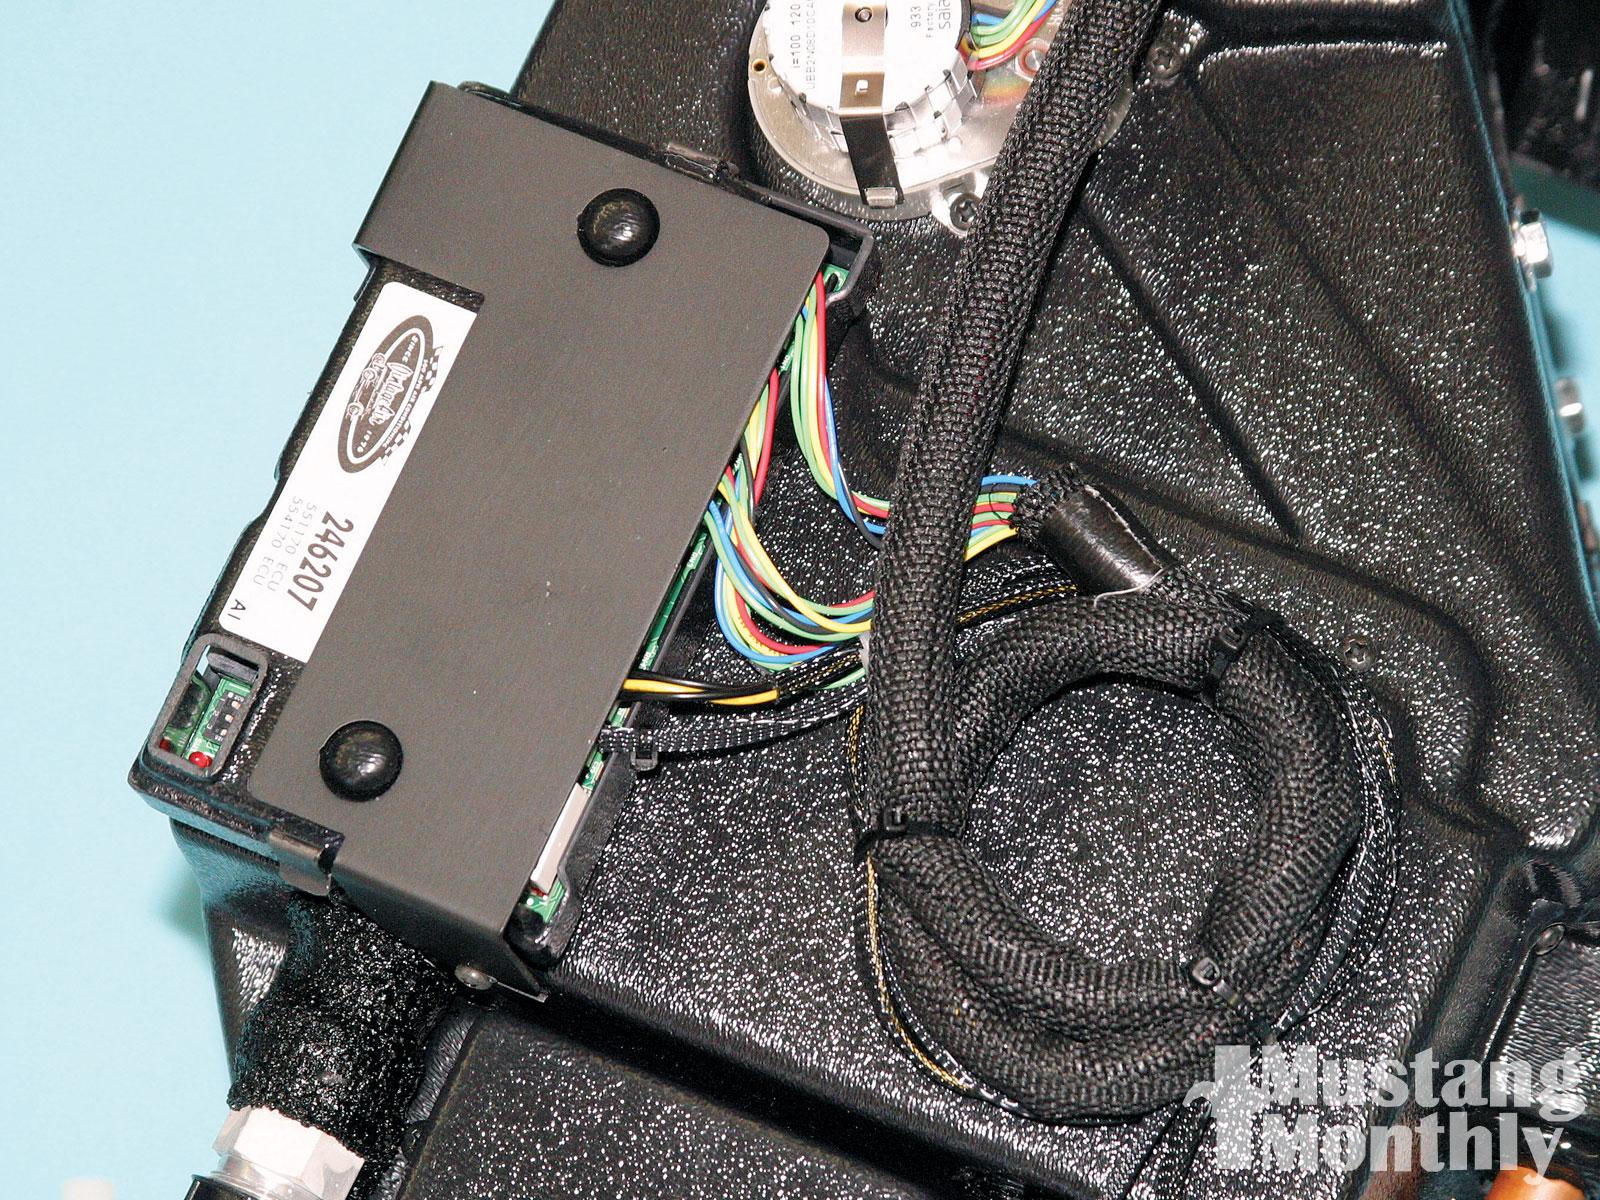 Mump 1007 04 O Air Conditioning Installation Microprocessor Technology